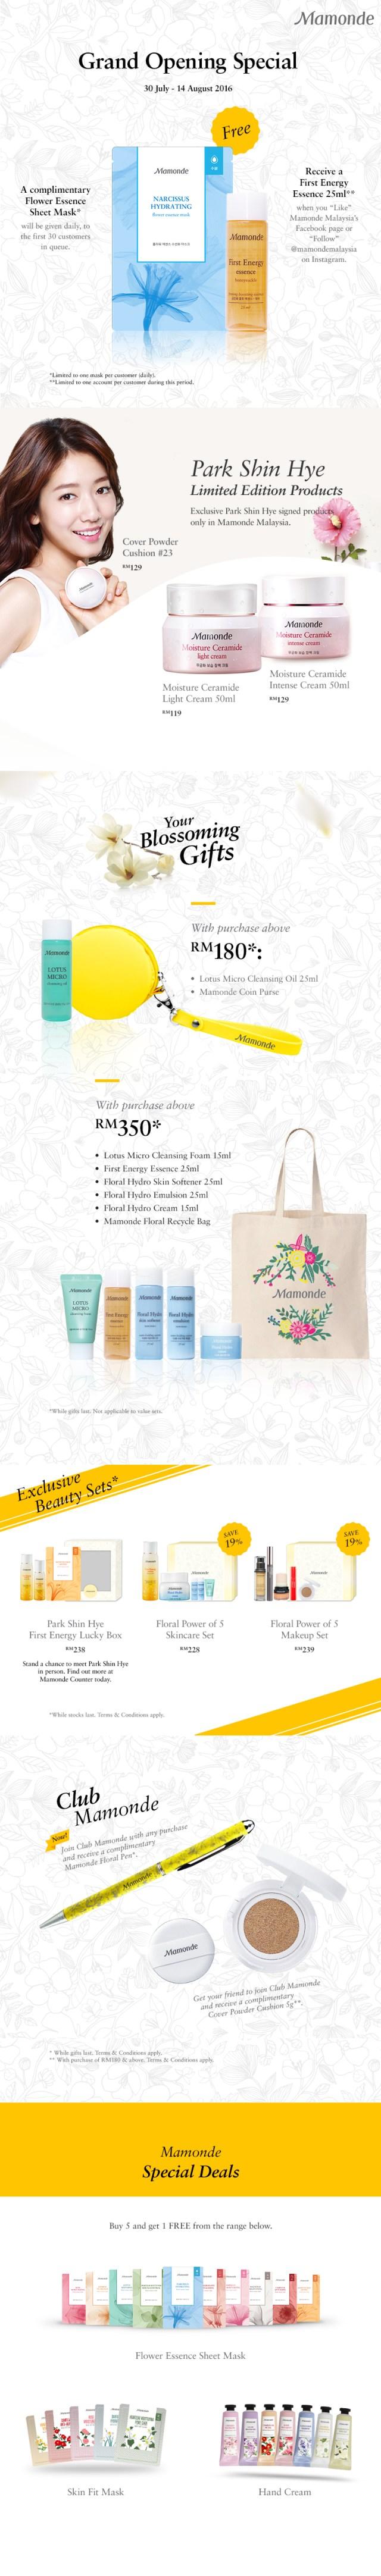 Mamonde, Kuala Lumpur, 1 Utama, Mamonde Cushion, Cushion Foundation, Korean, Korean Beauty, Makeup, Cushion Makeup, Skincare,